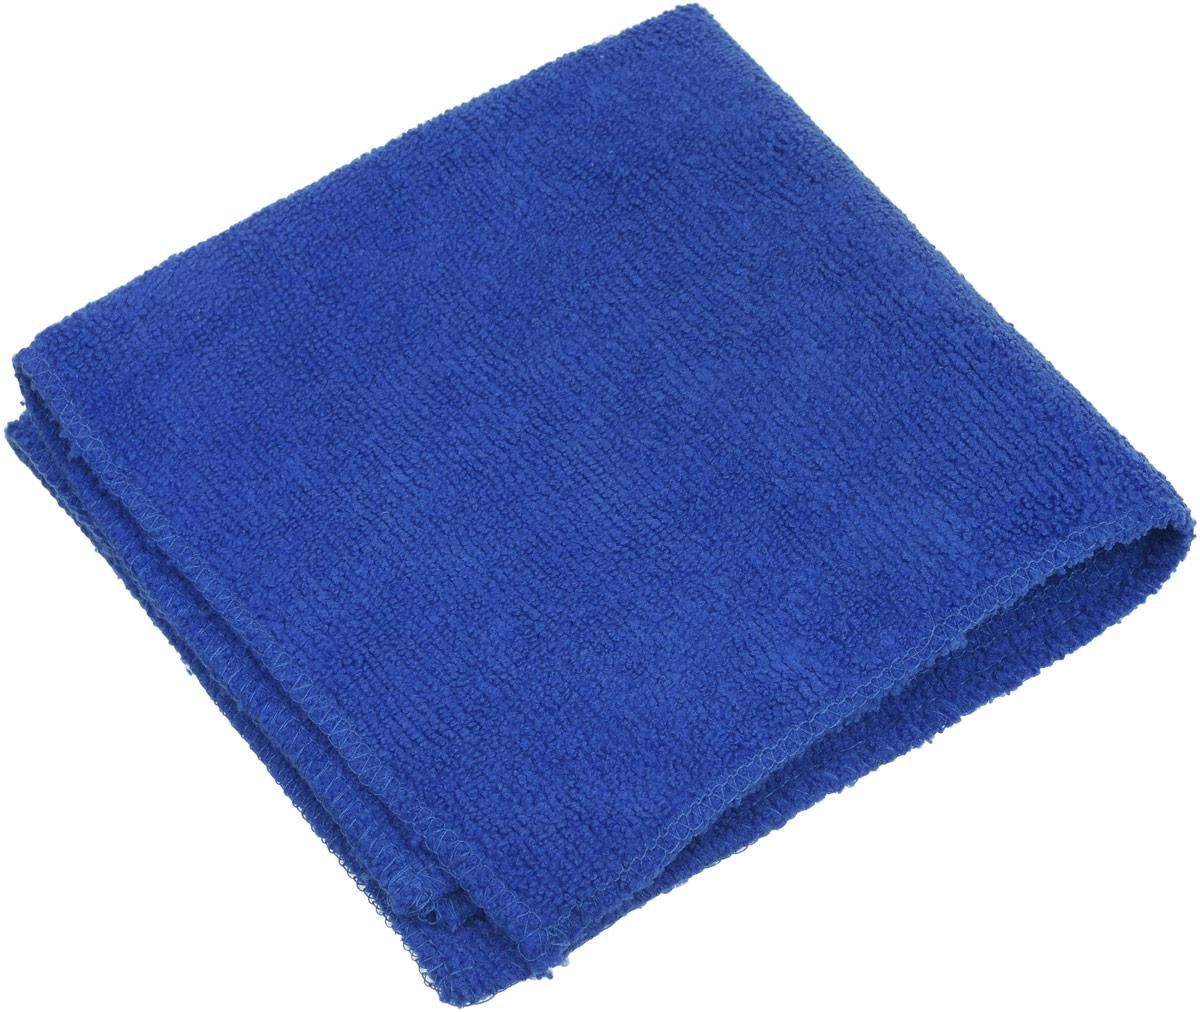 Салфетка для уборки Eva, цвет: синий, 30 х 30 см чехол для сноуборда dakine freestyle цвет черный белый 30 х 16 х 157 см